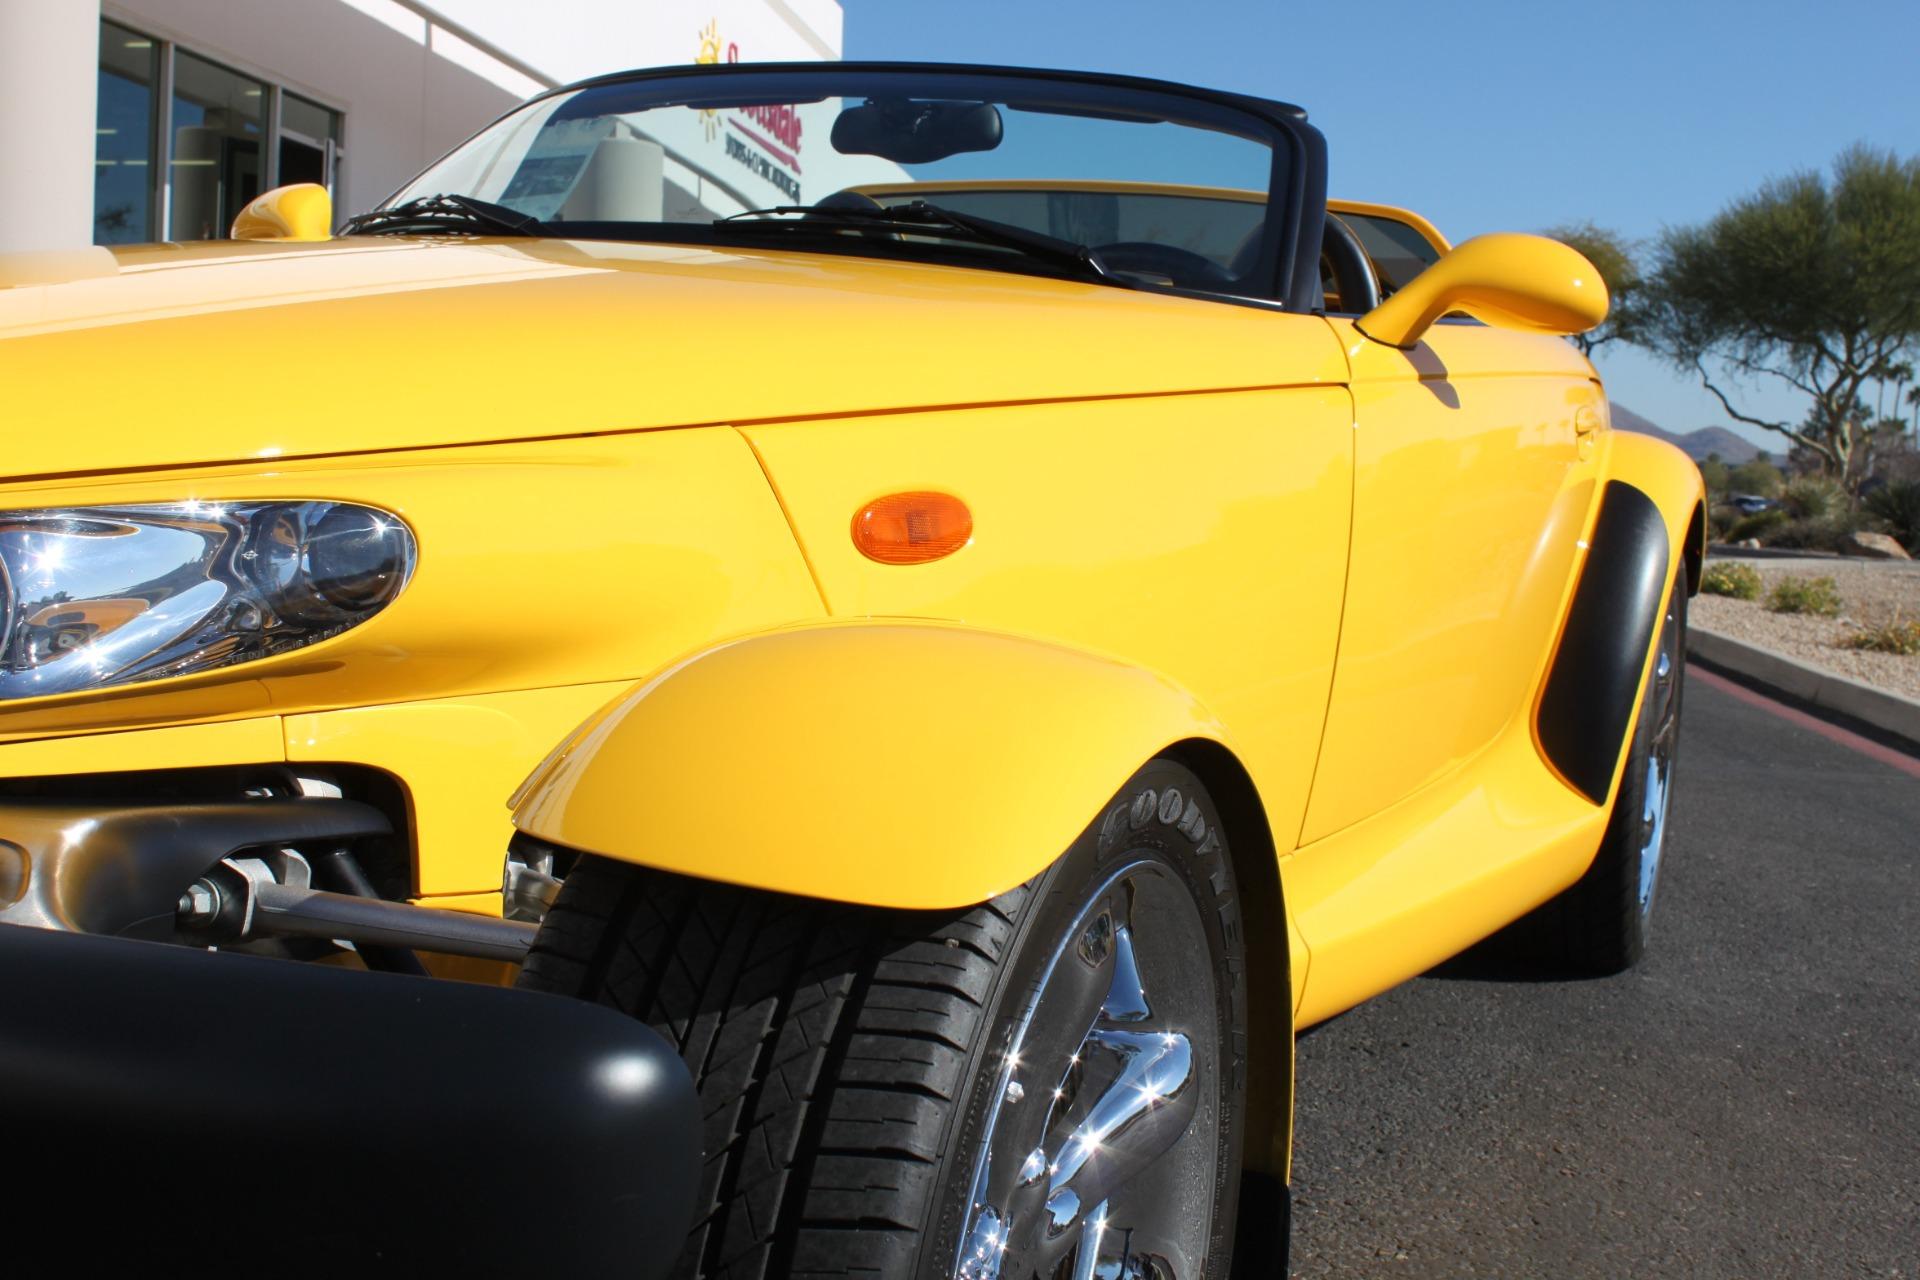 Used-2002-Chrysler-Prowler-Camaro